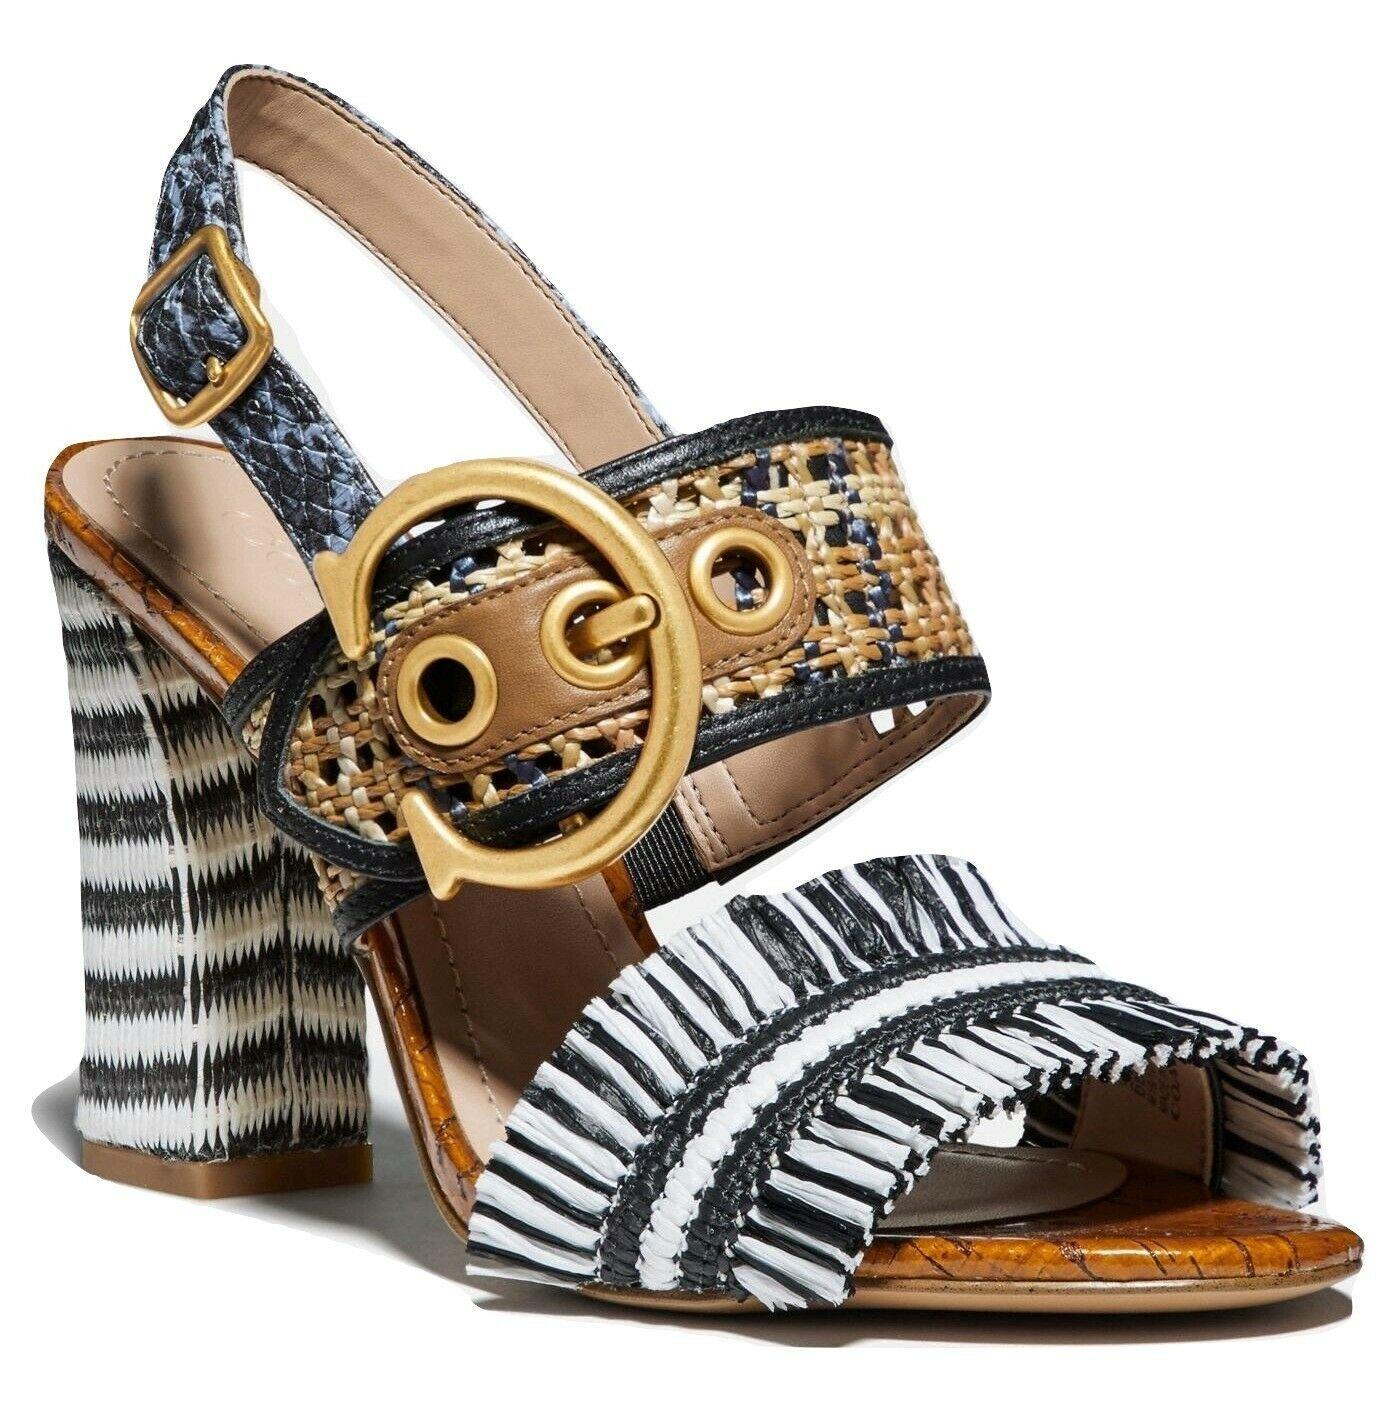 Coach Robin C-Buckle Raffia Slingback Sandals Size 10 - $148.49